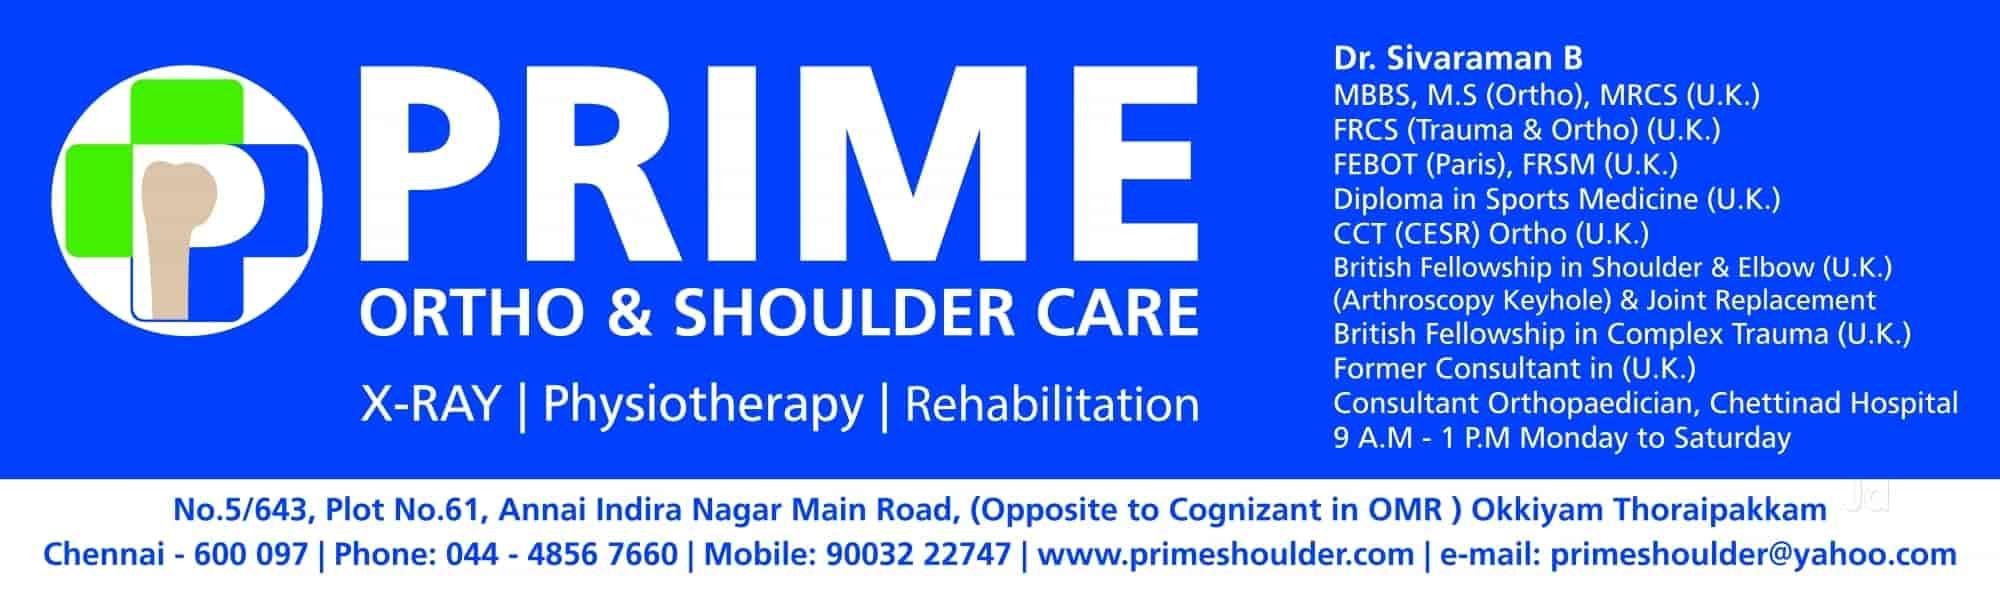 Prime Ortho & Shoulder Care - Hospitals - Book Appointment Online